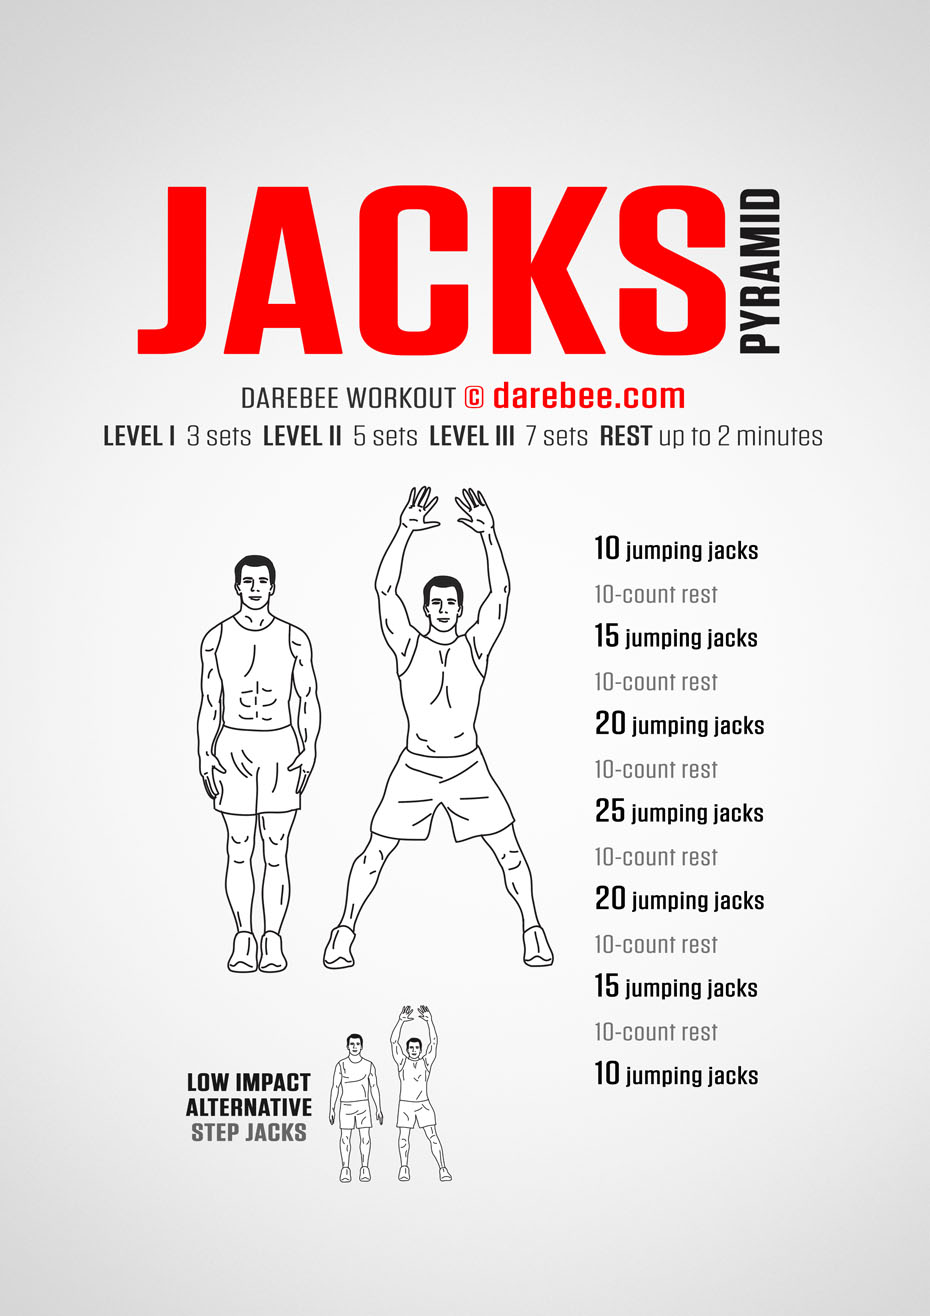 jacks pyramid workout Jumping Jacks Workout for Beginners